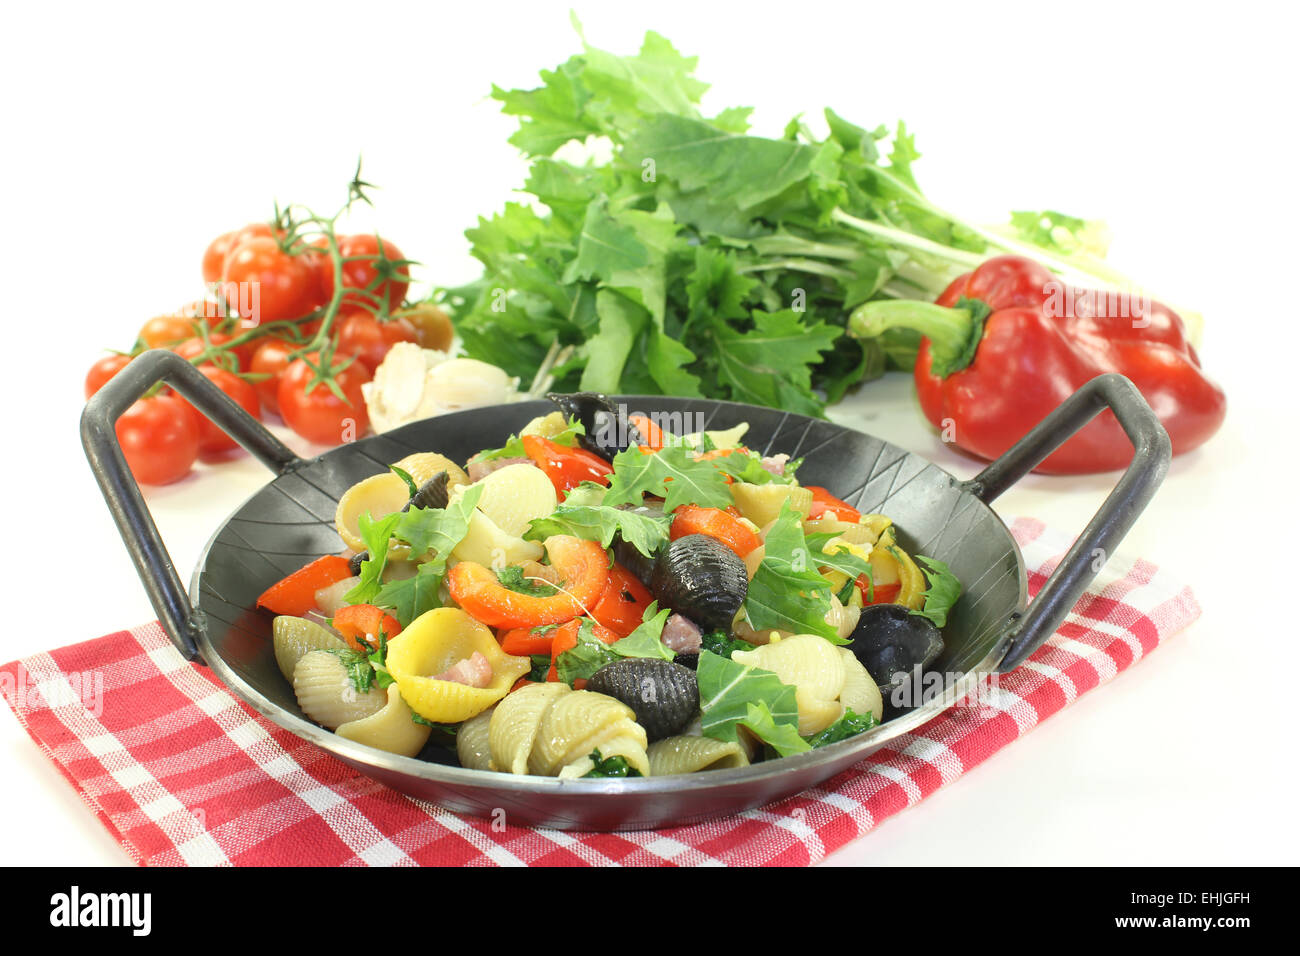 Pasta pan with turnip greens Stock Photo